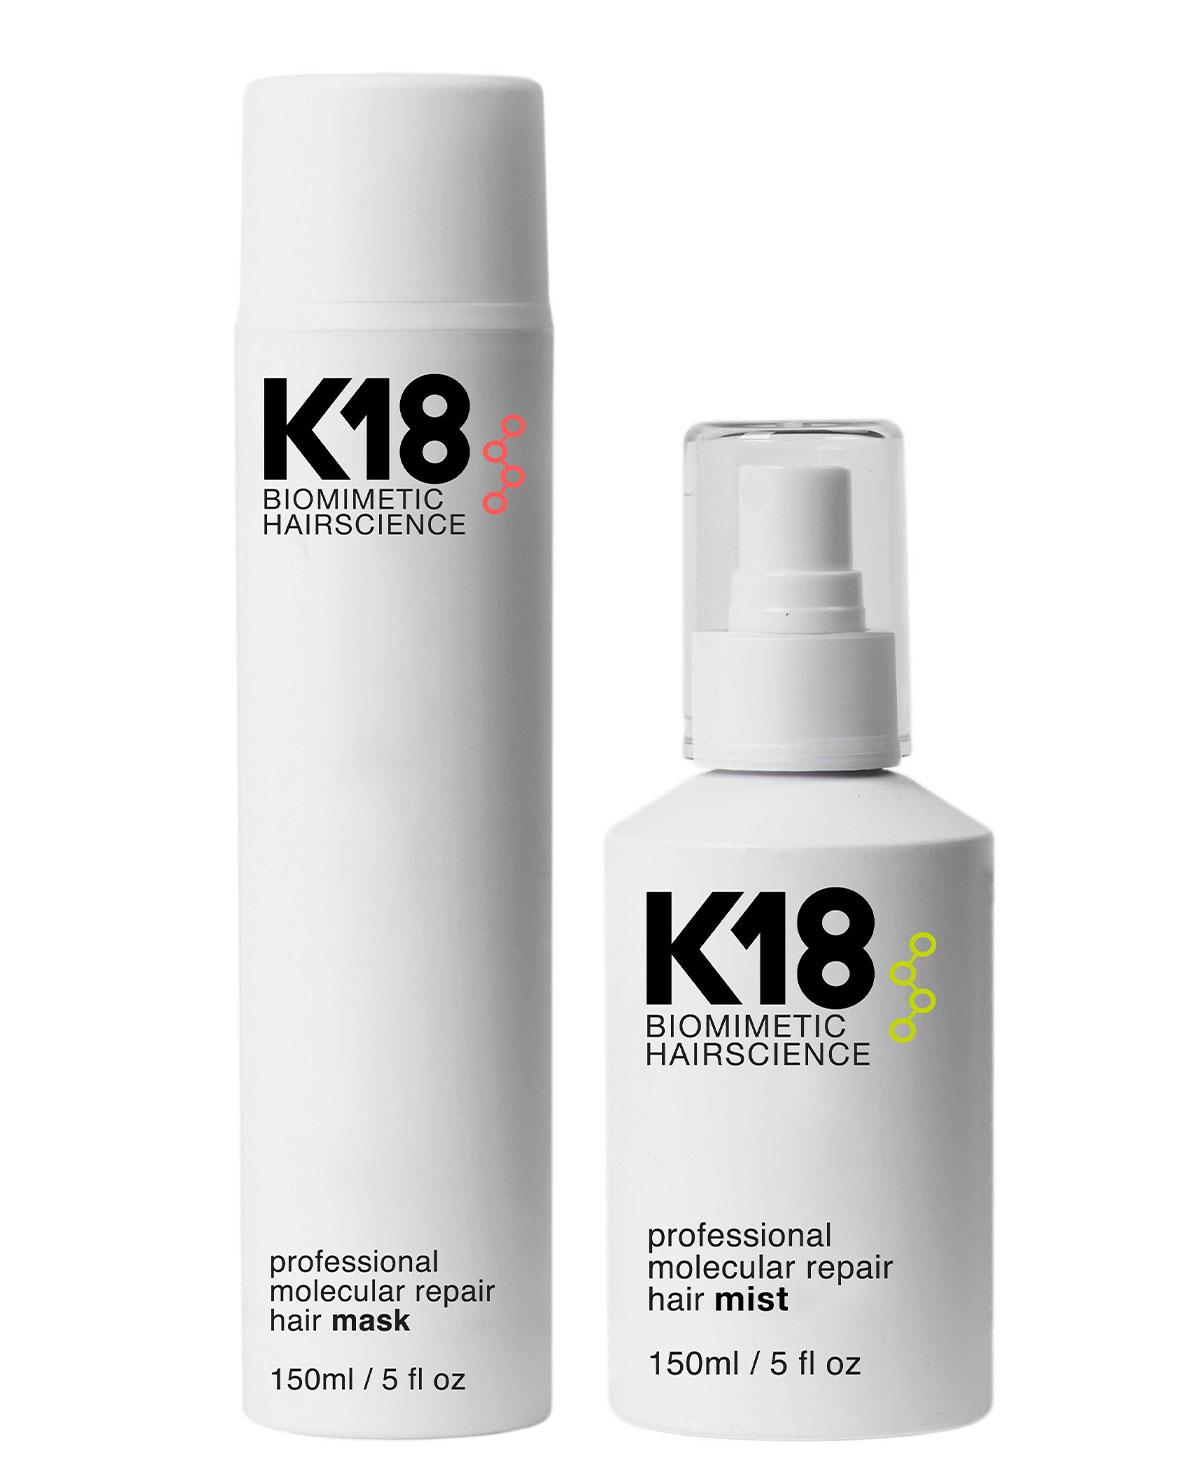 K18 Salon Test Pack